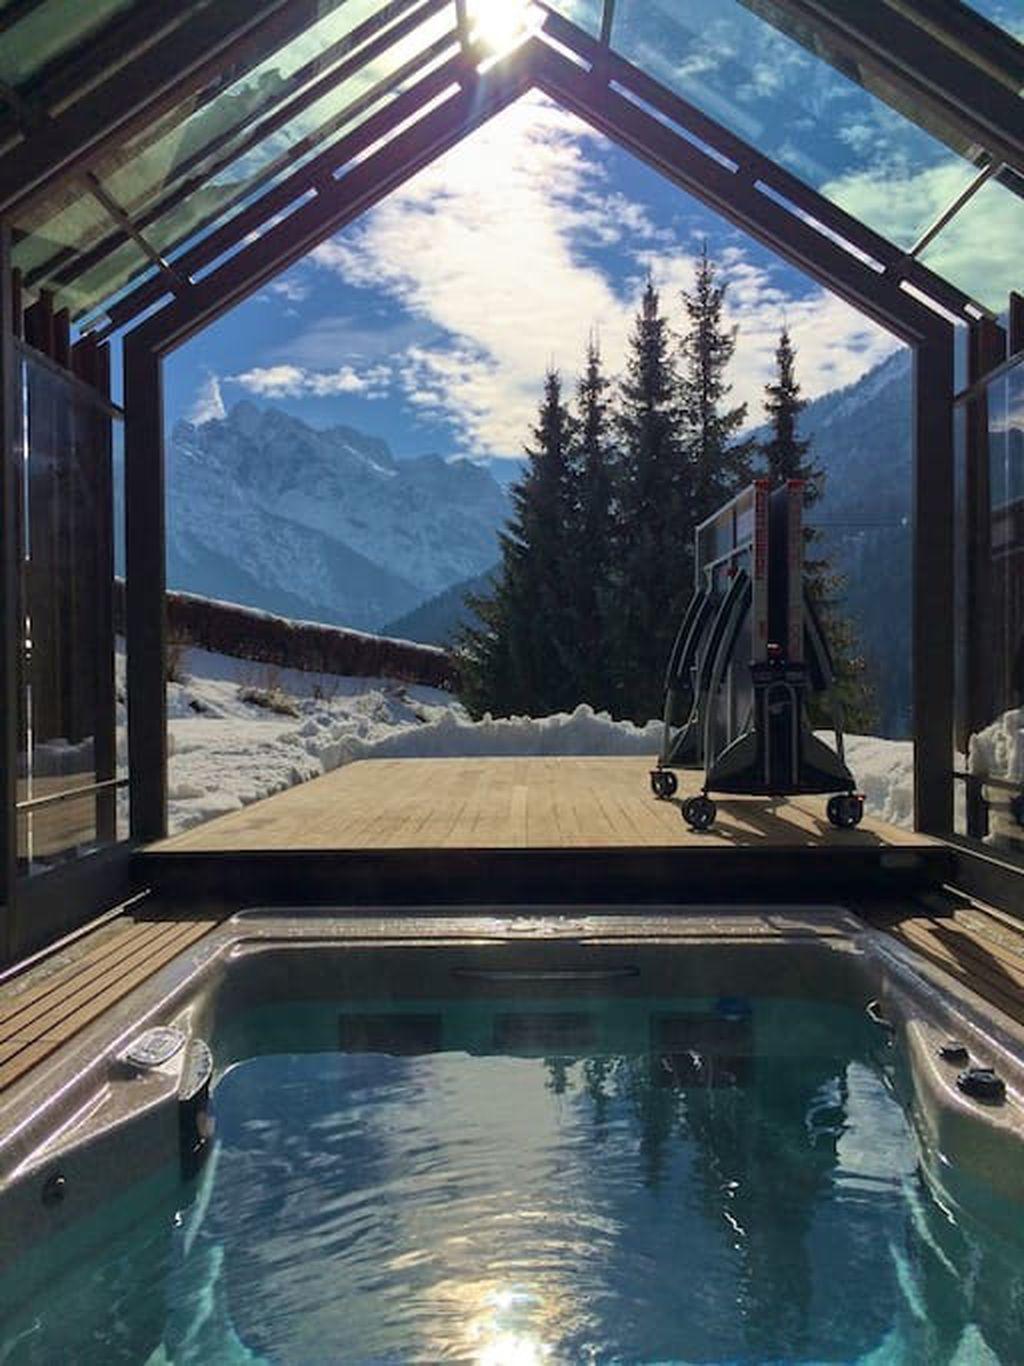 Luksuzna koliba s natkrivenim bazenom